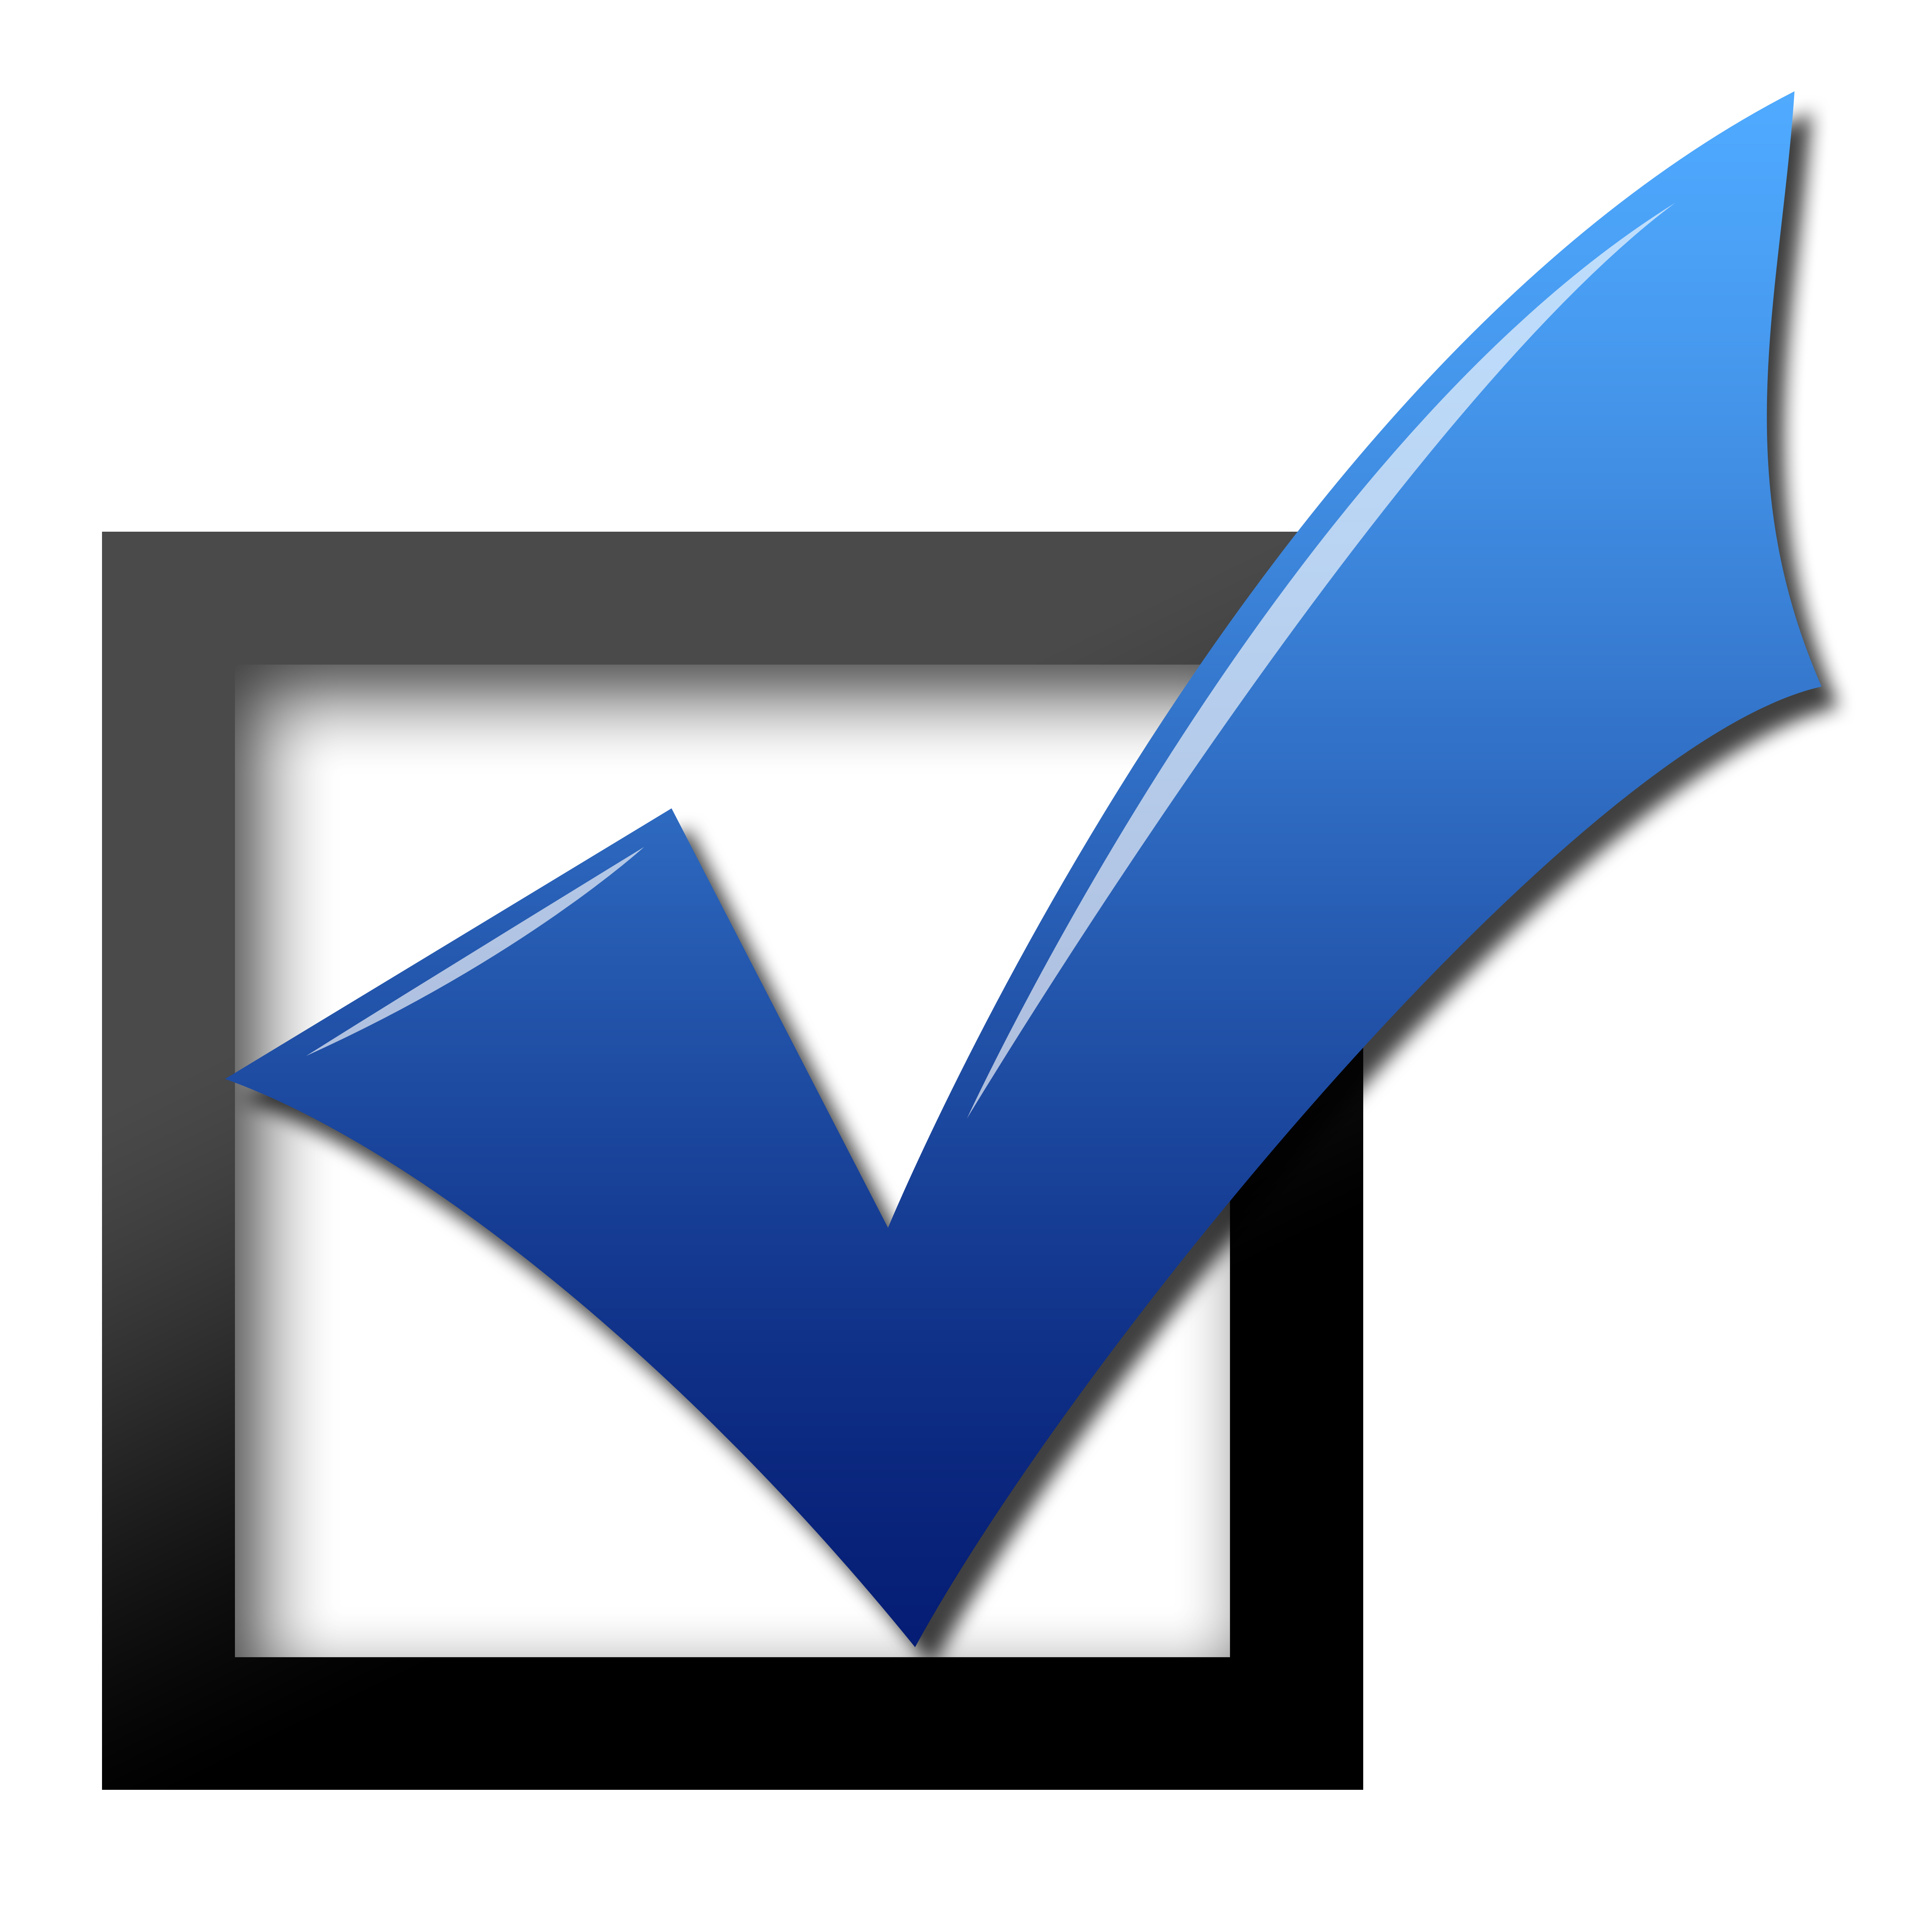 Voter checkbox clipart clip free stock Free Checkbox Cliparts, Download Free Clip Art, Free Clip ... clip free stock